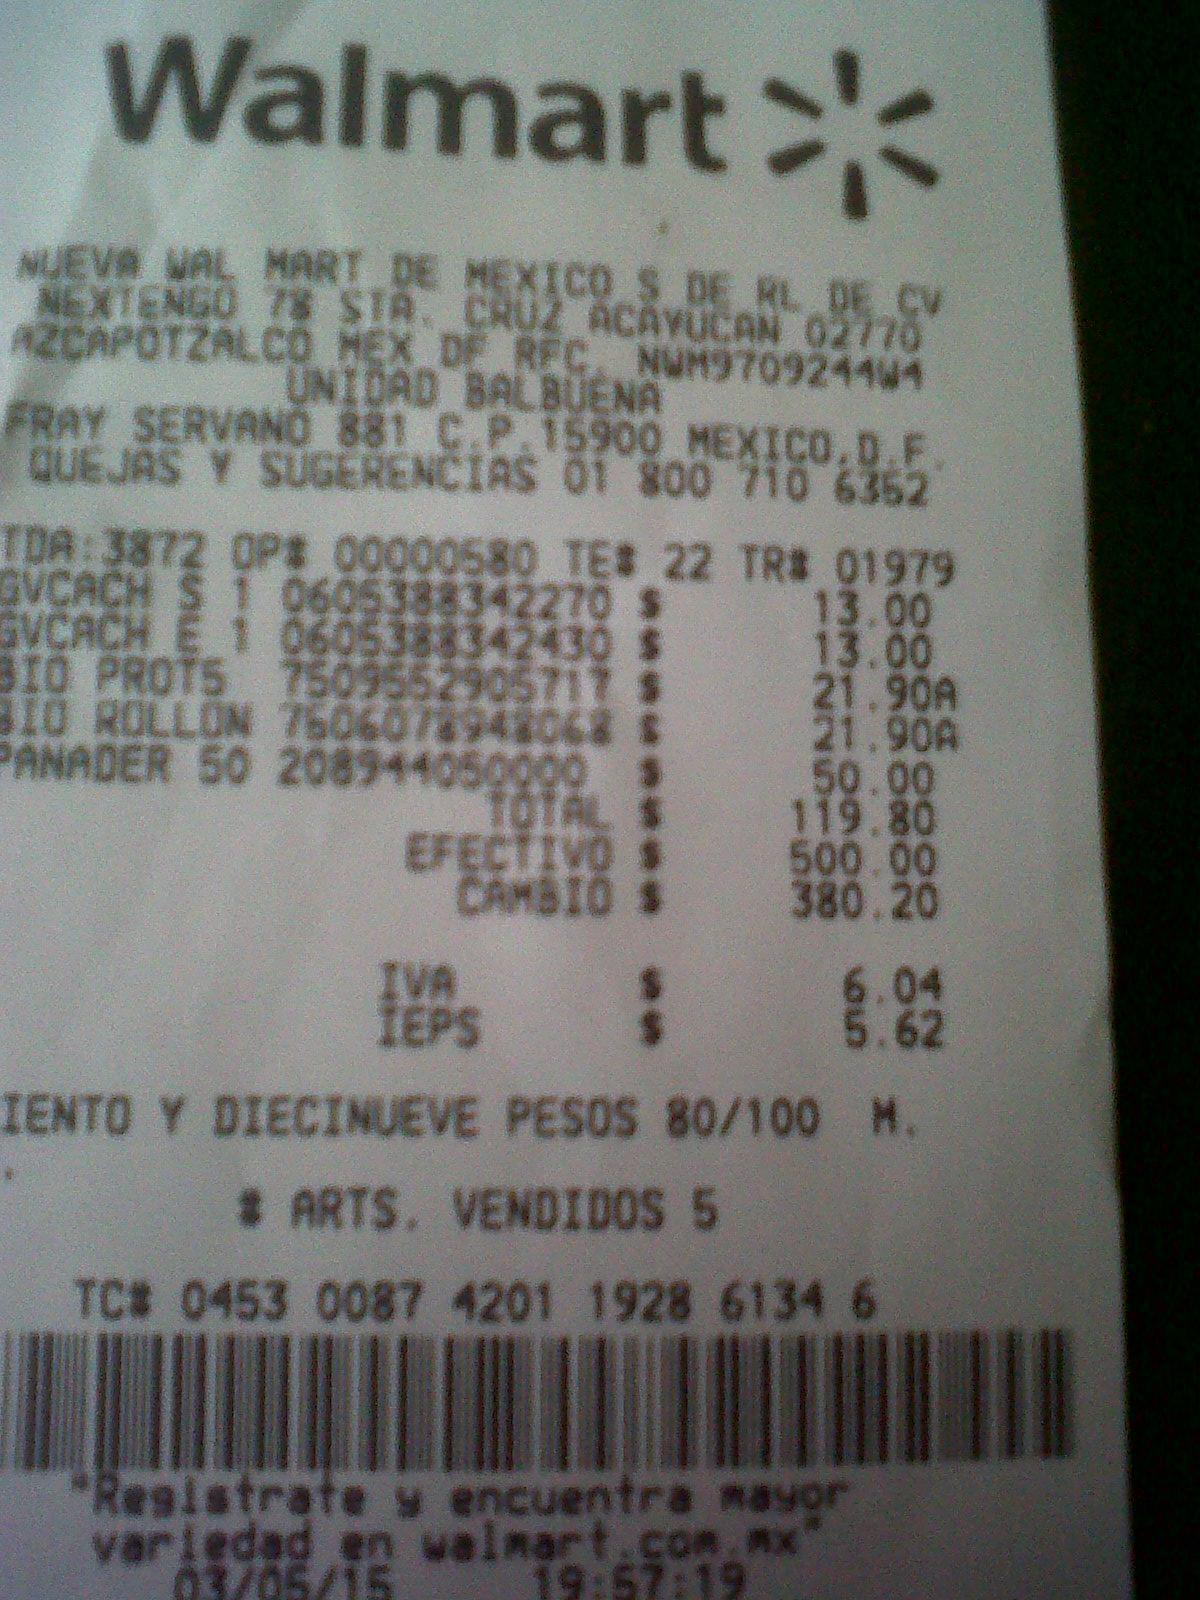 Walmart: Desodorante Femenino Bi-O Garnier $21.90